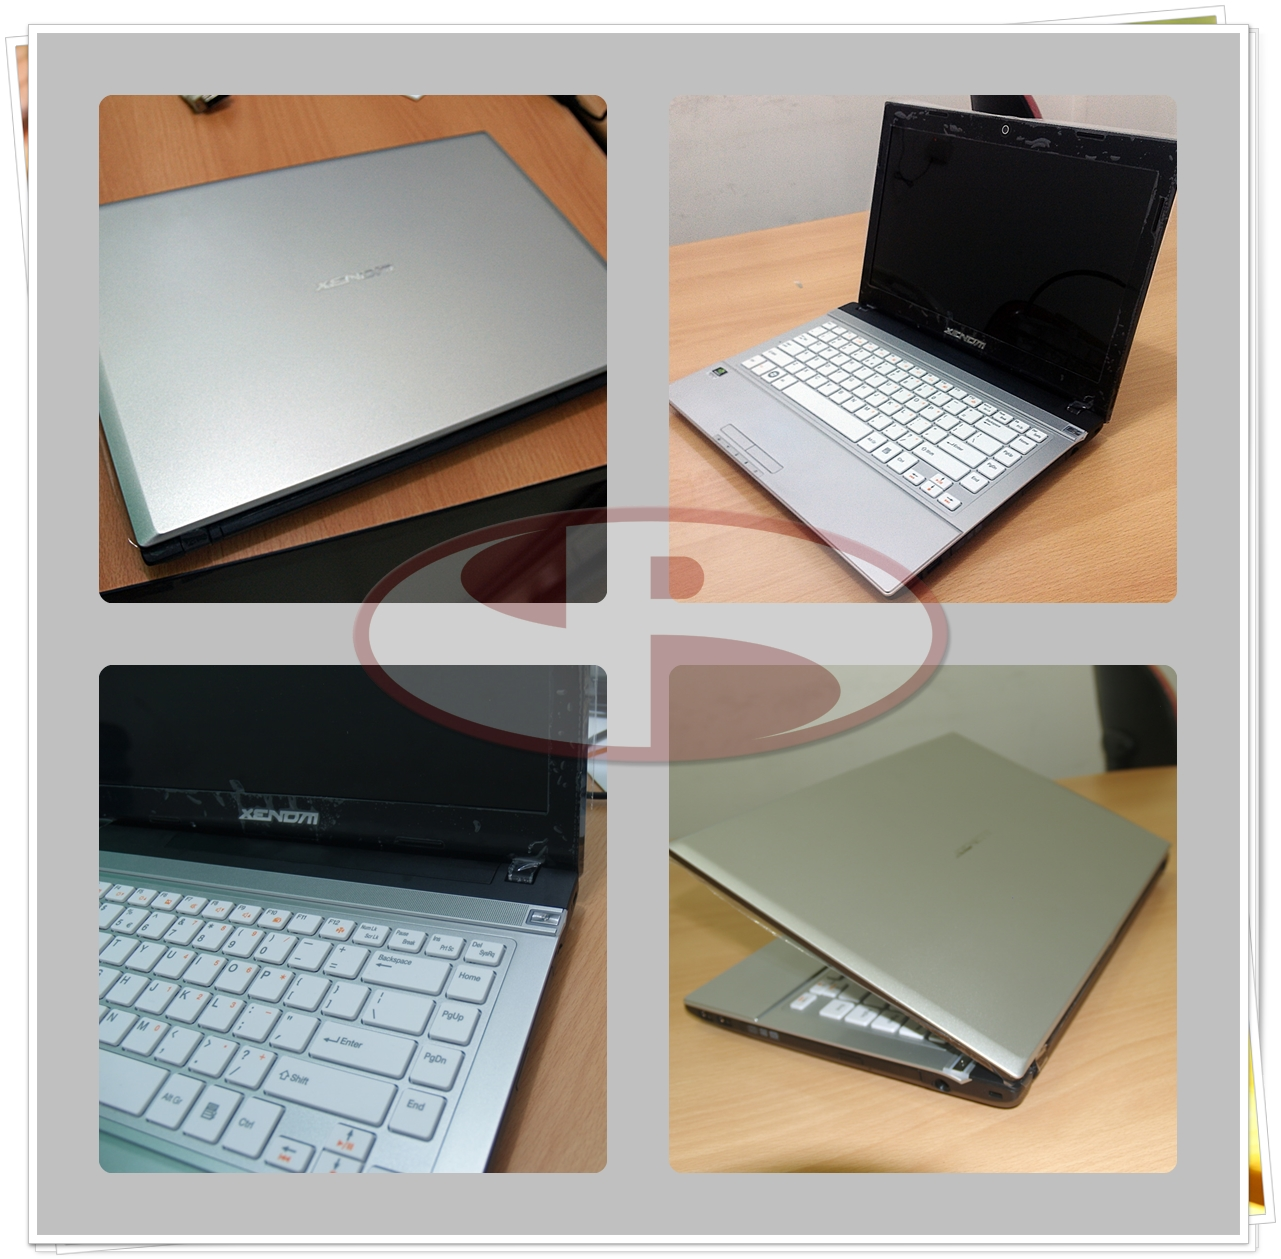 Perpaduan Silver, hitam dan putih pada keyboard menguatkan kesan simple dan elegan.